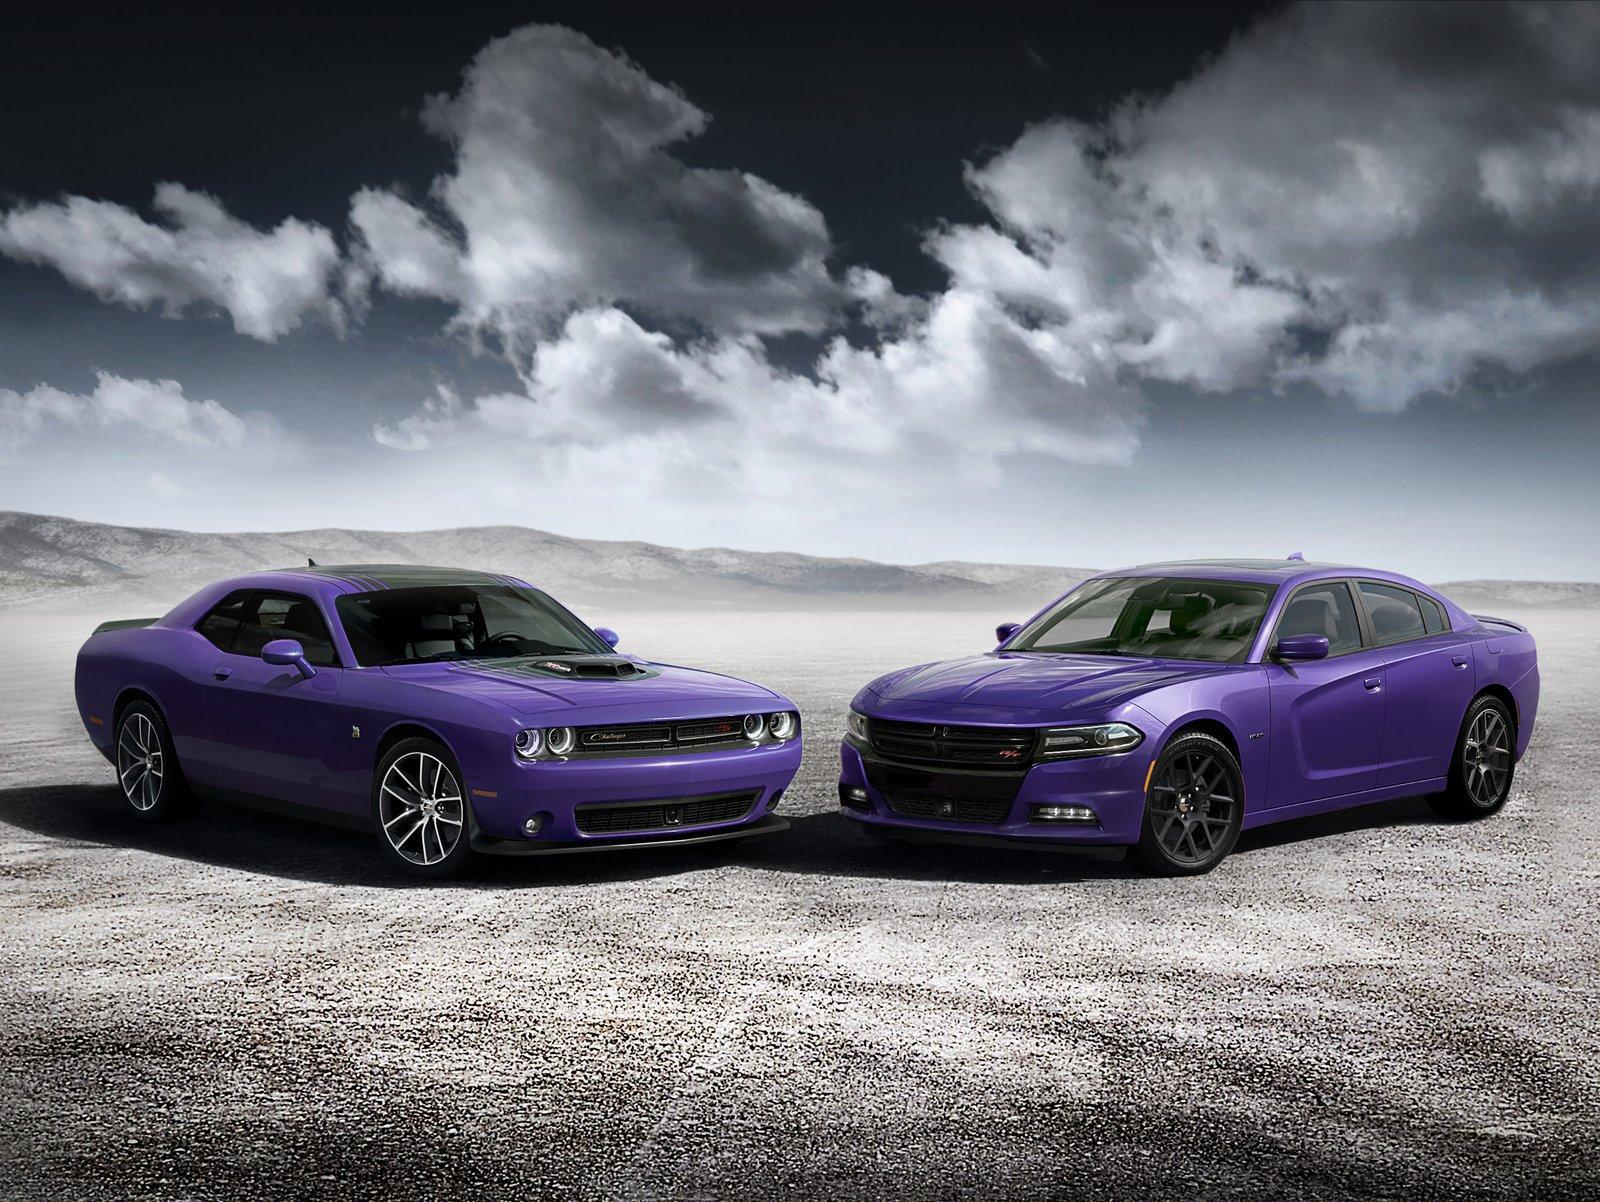 2016 Dodge Challenger Order Date and Details Revealed ...